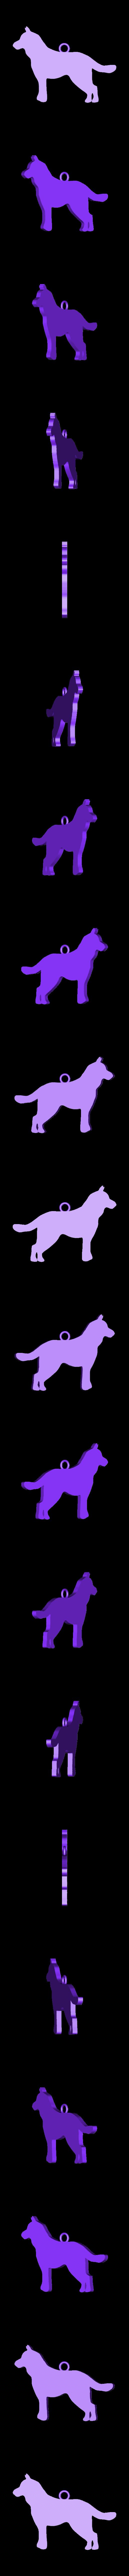 25.stl Download STL file Dogs • 3D printing object, GENNADI3313